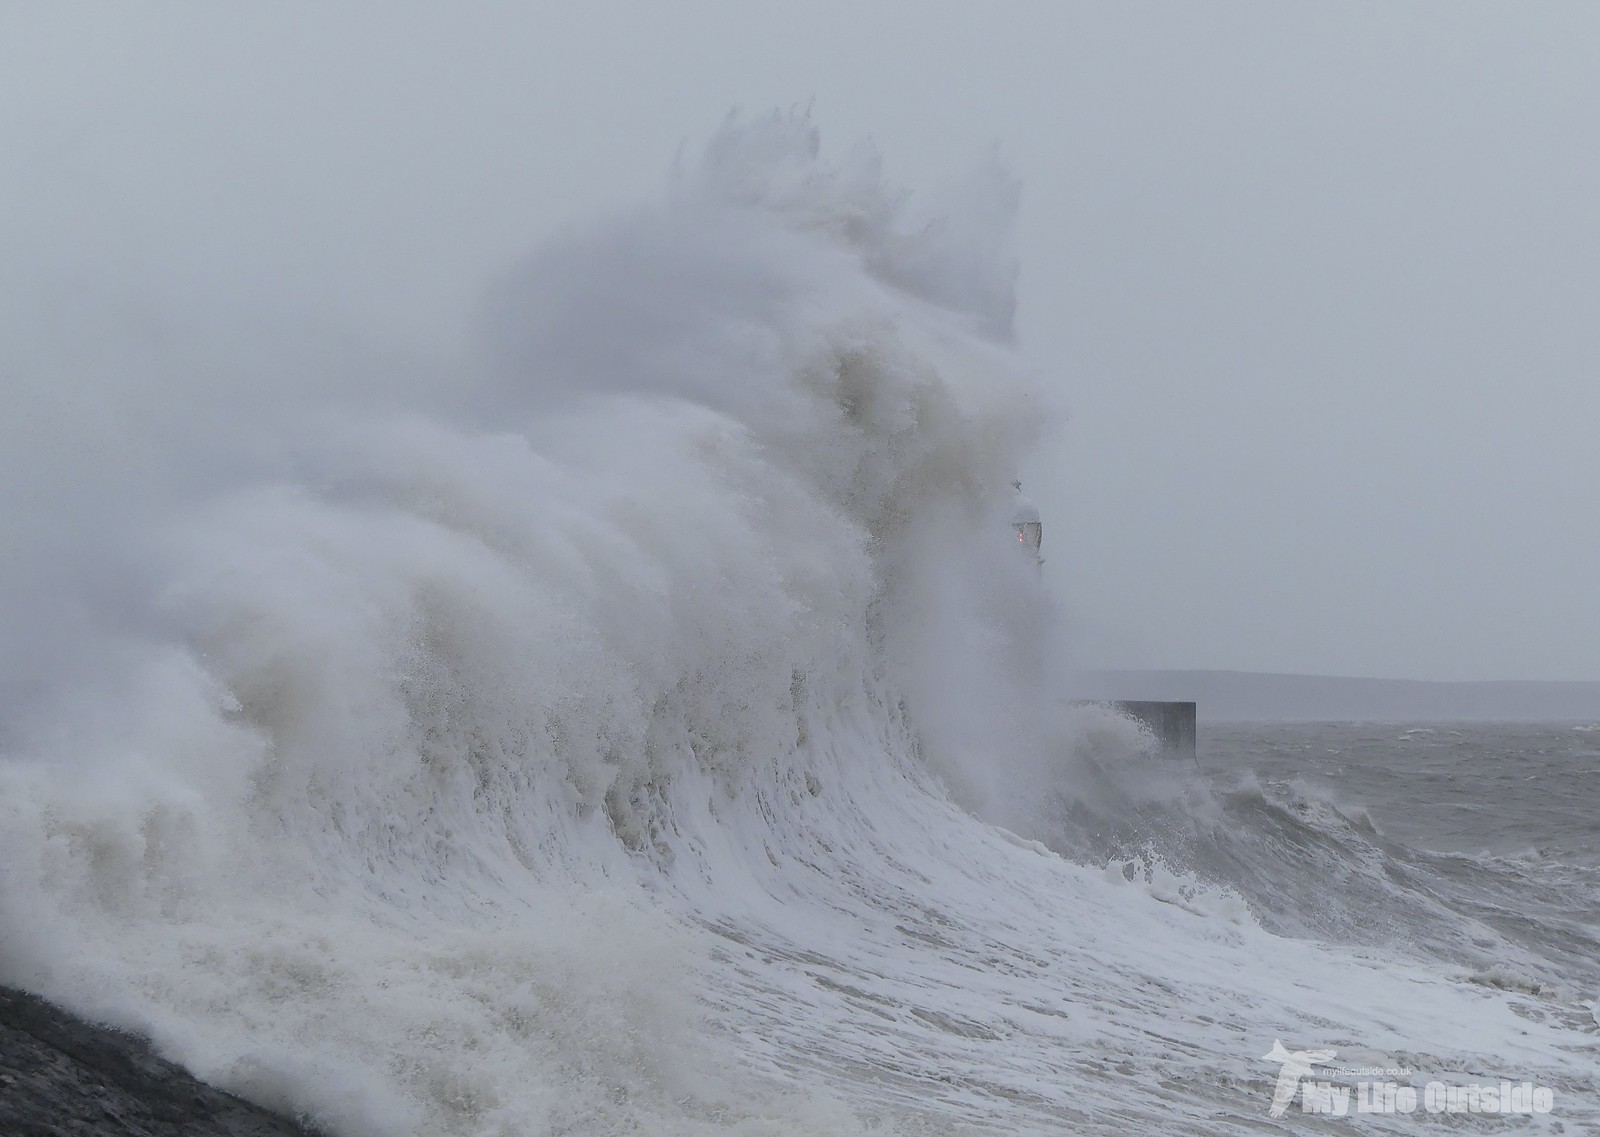 P1230423 - Storm Dennis, Porthcawl